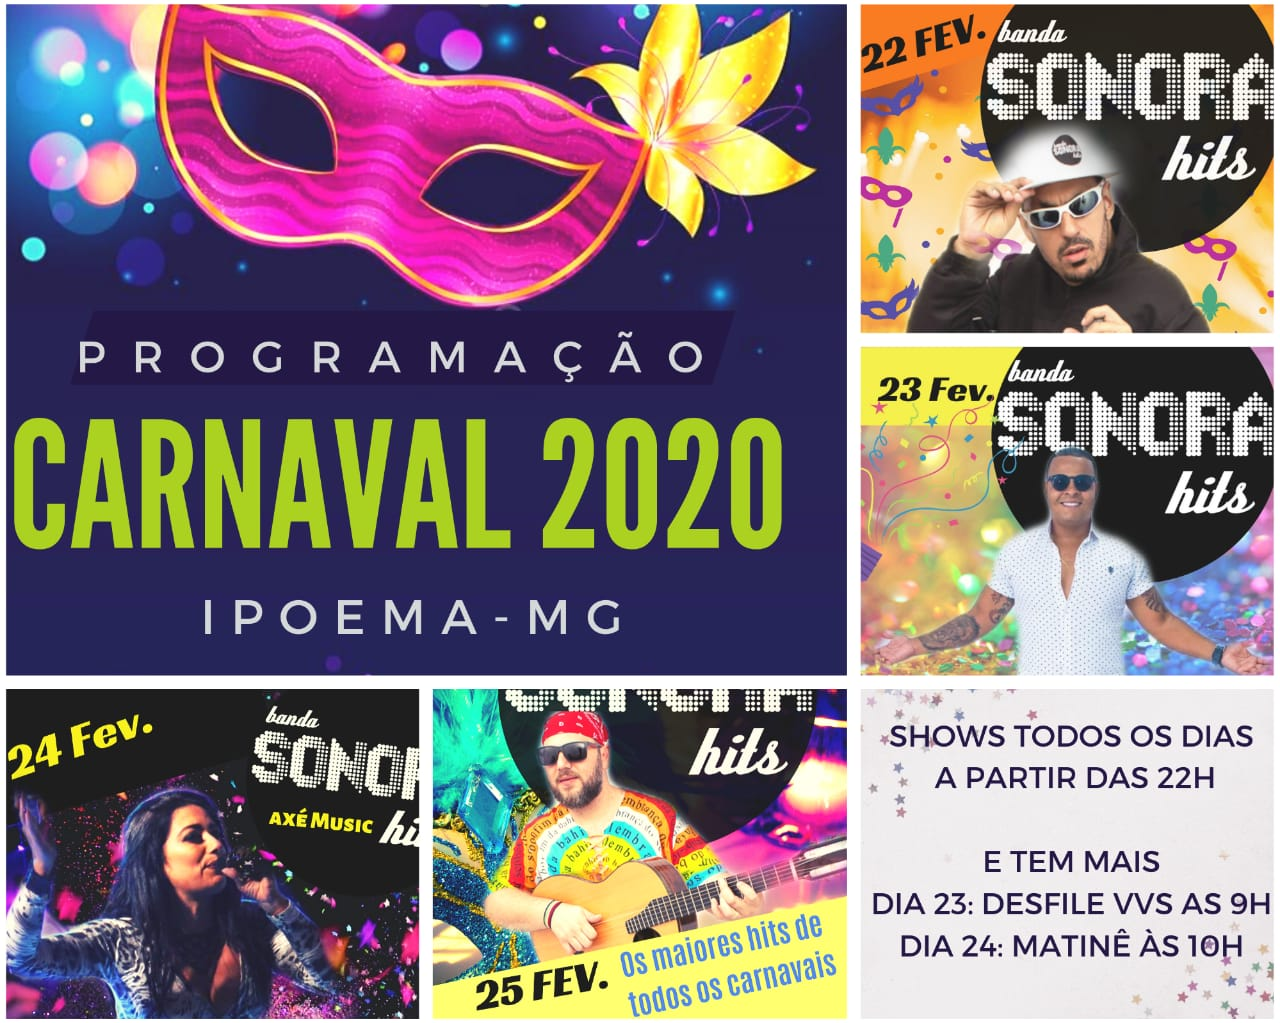 Carnaval em Ipoema